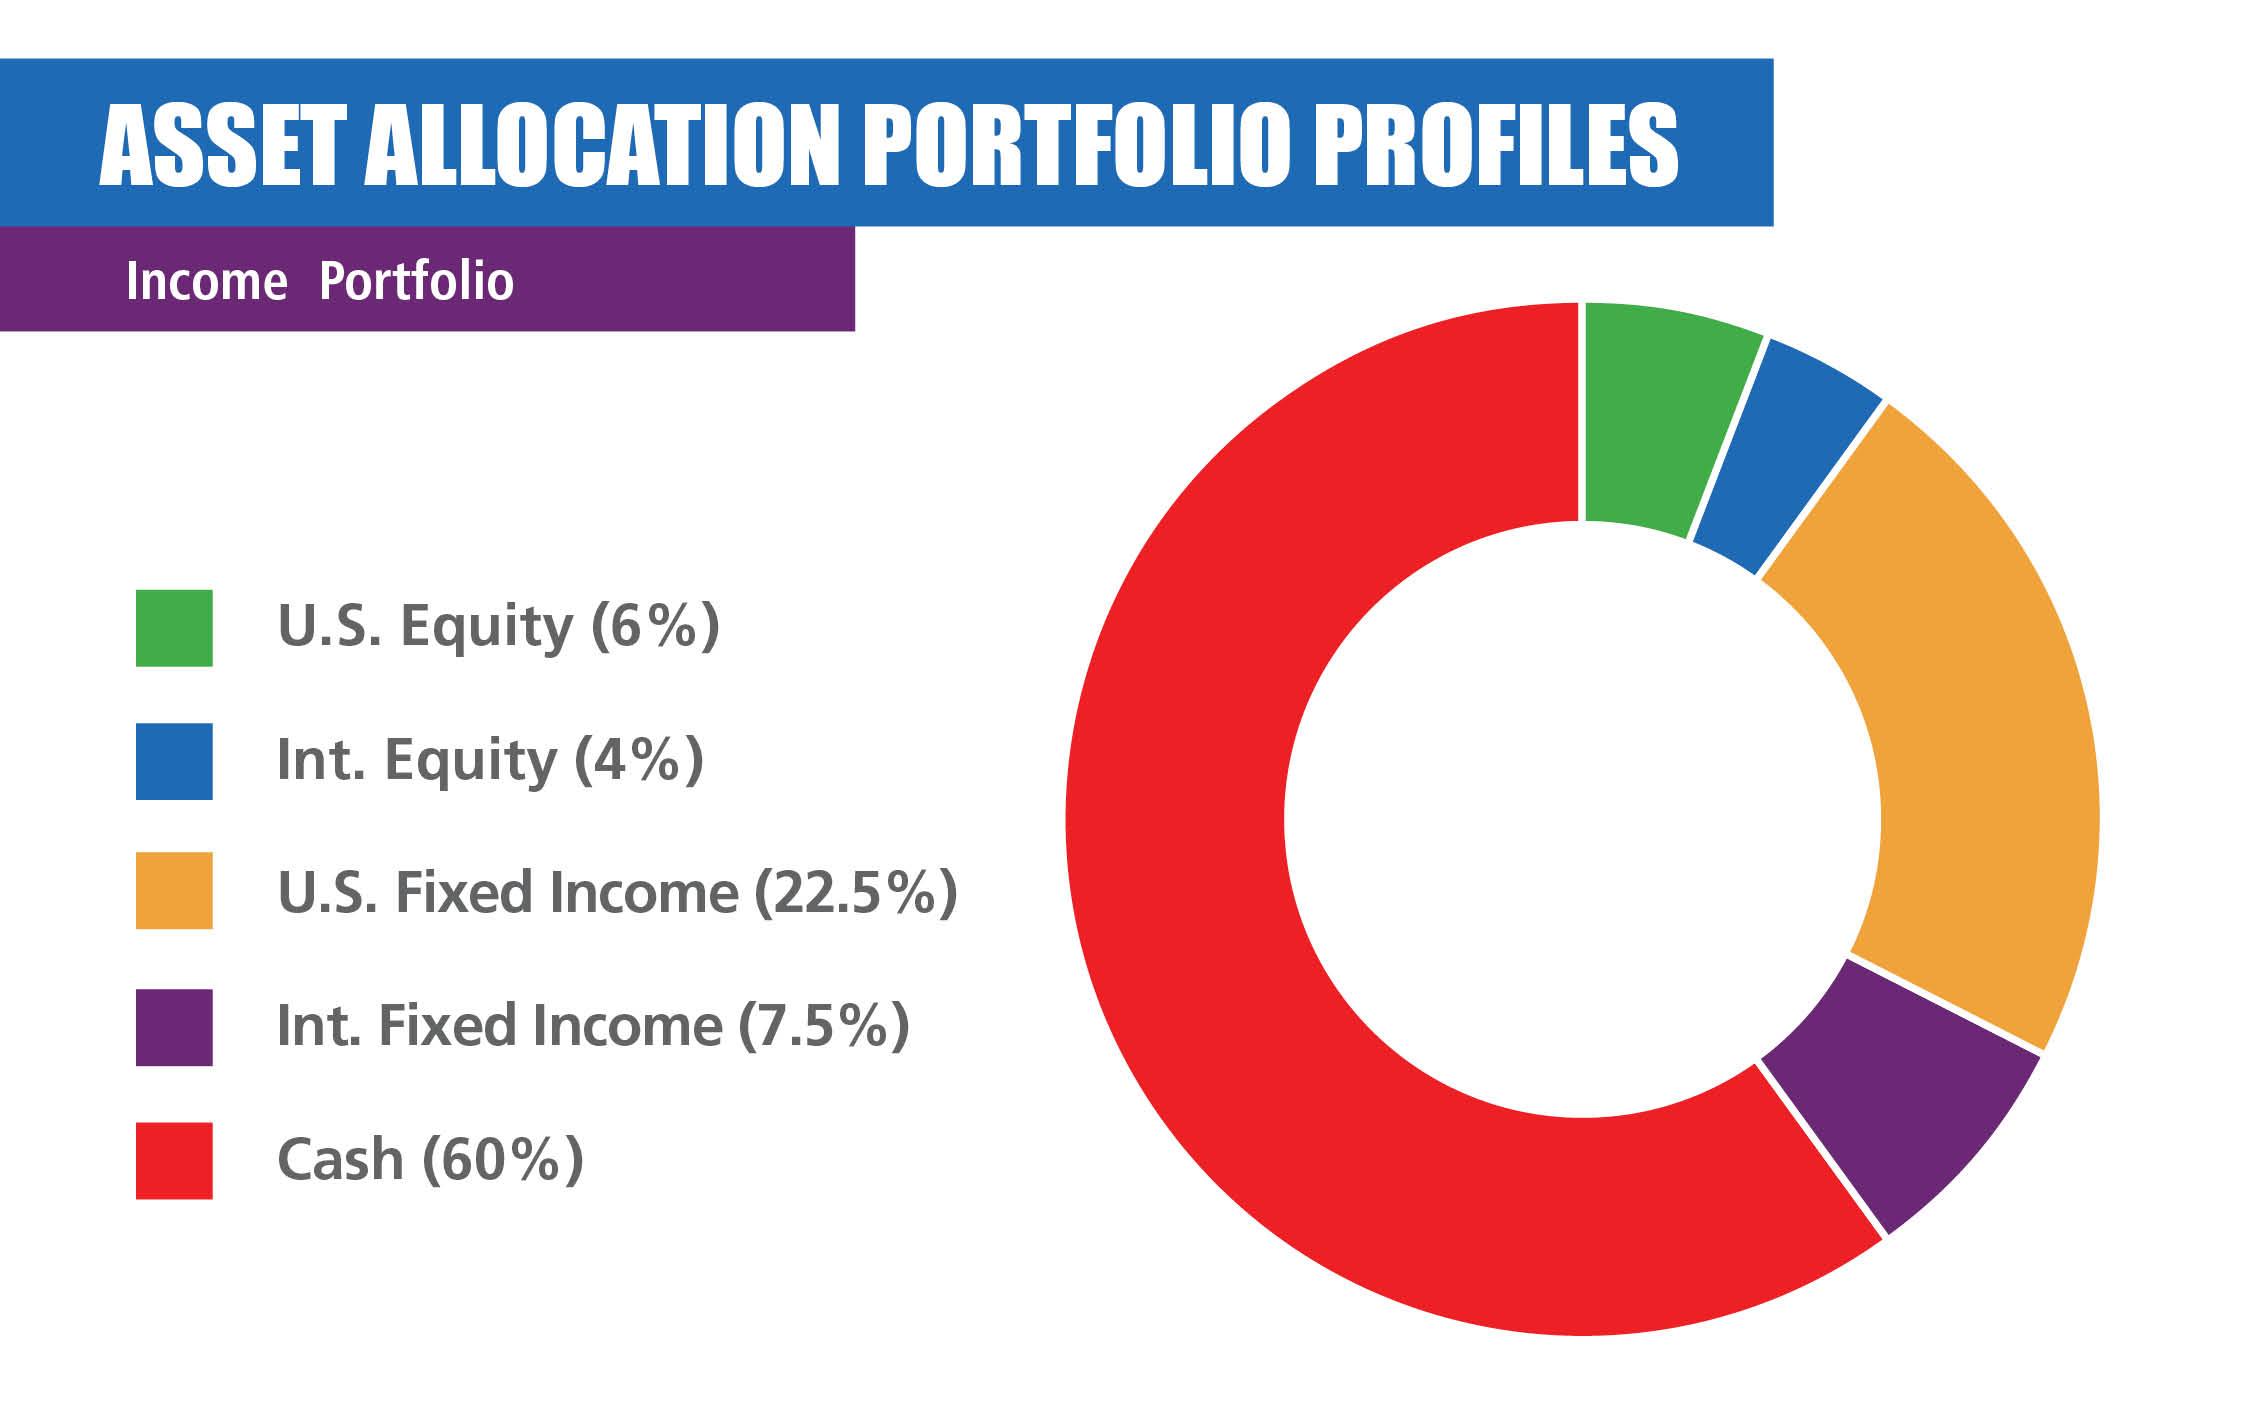 Income Portfolio